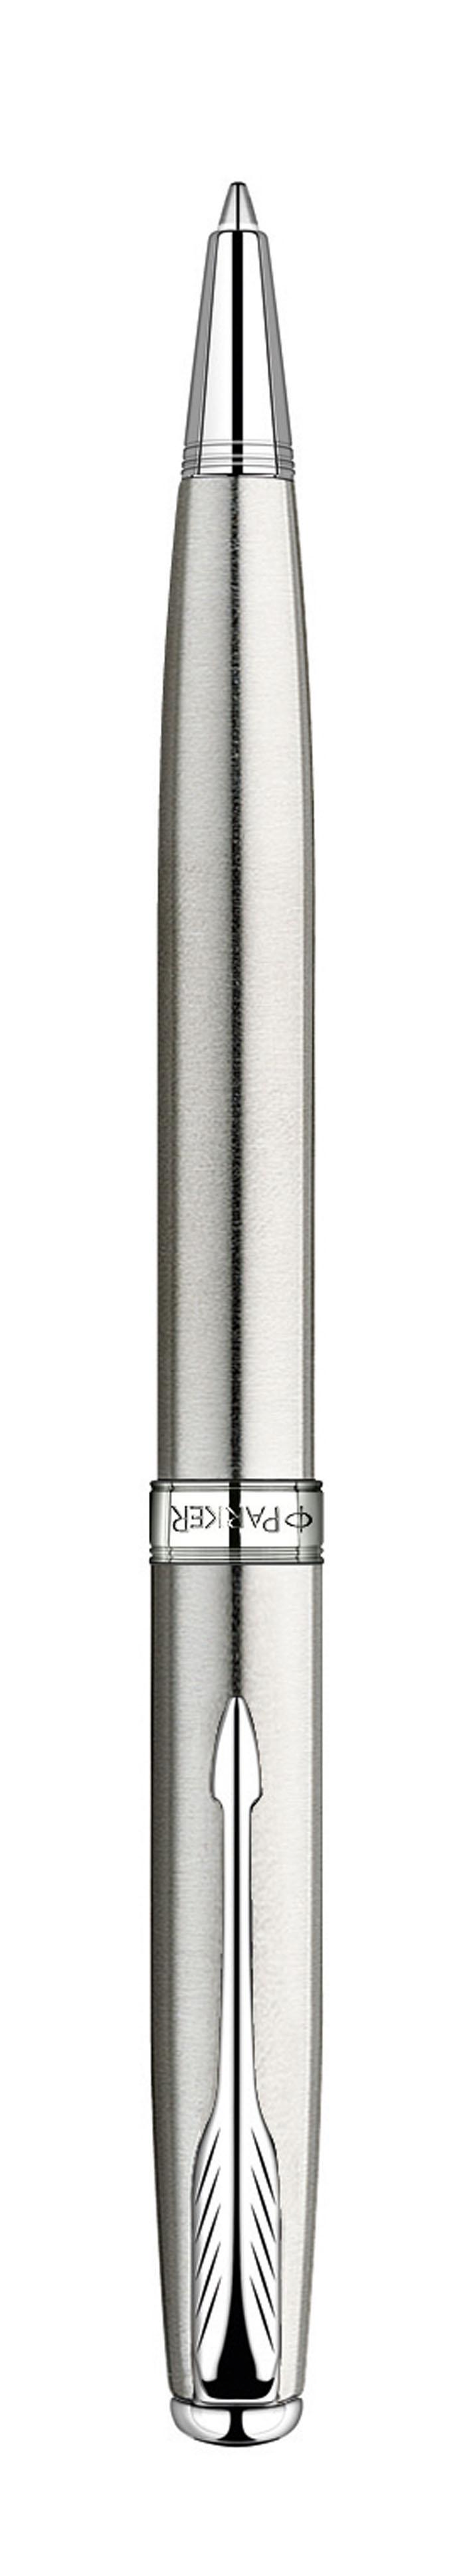 Parker Ручка шариковая Sonnet Stainless Steel СT parker стержень для ручки роллера цвет синий